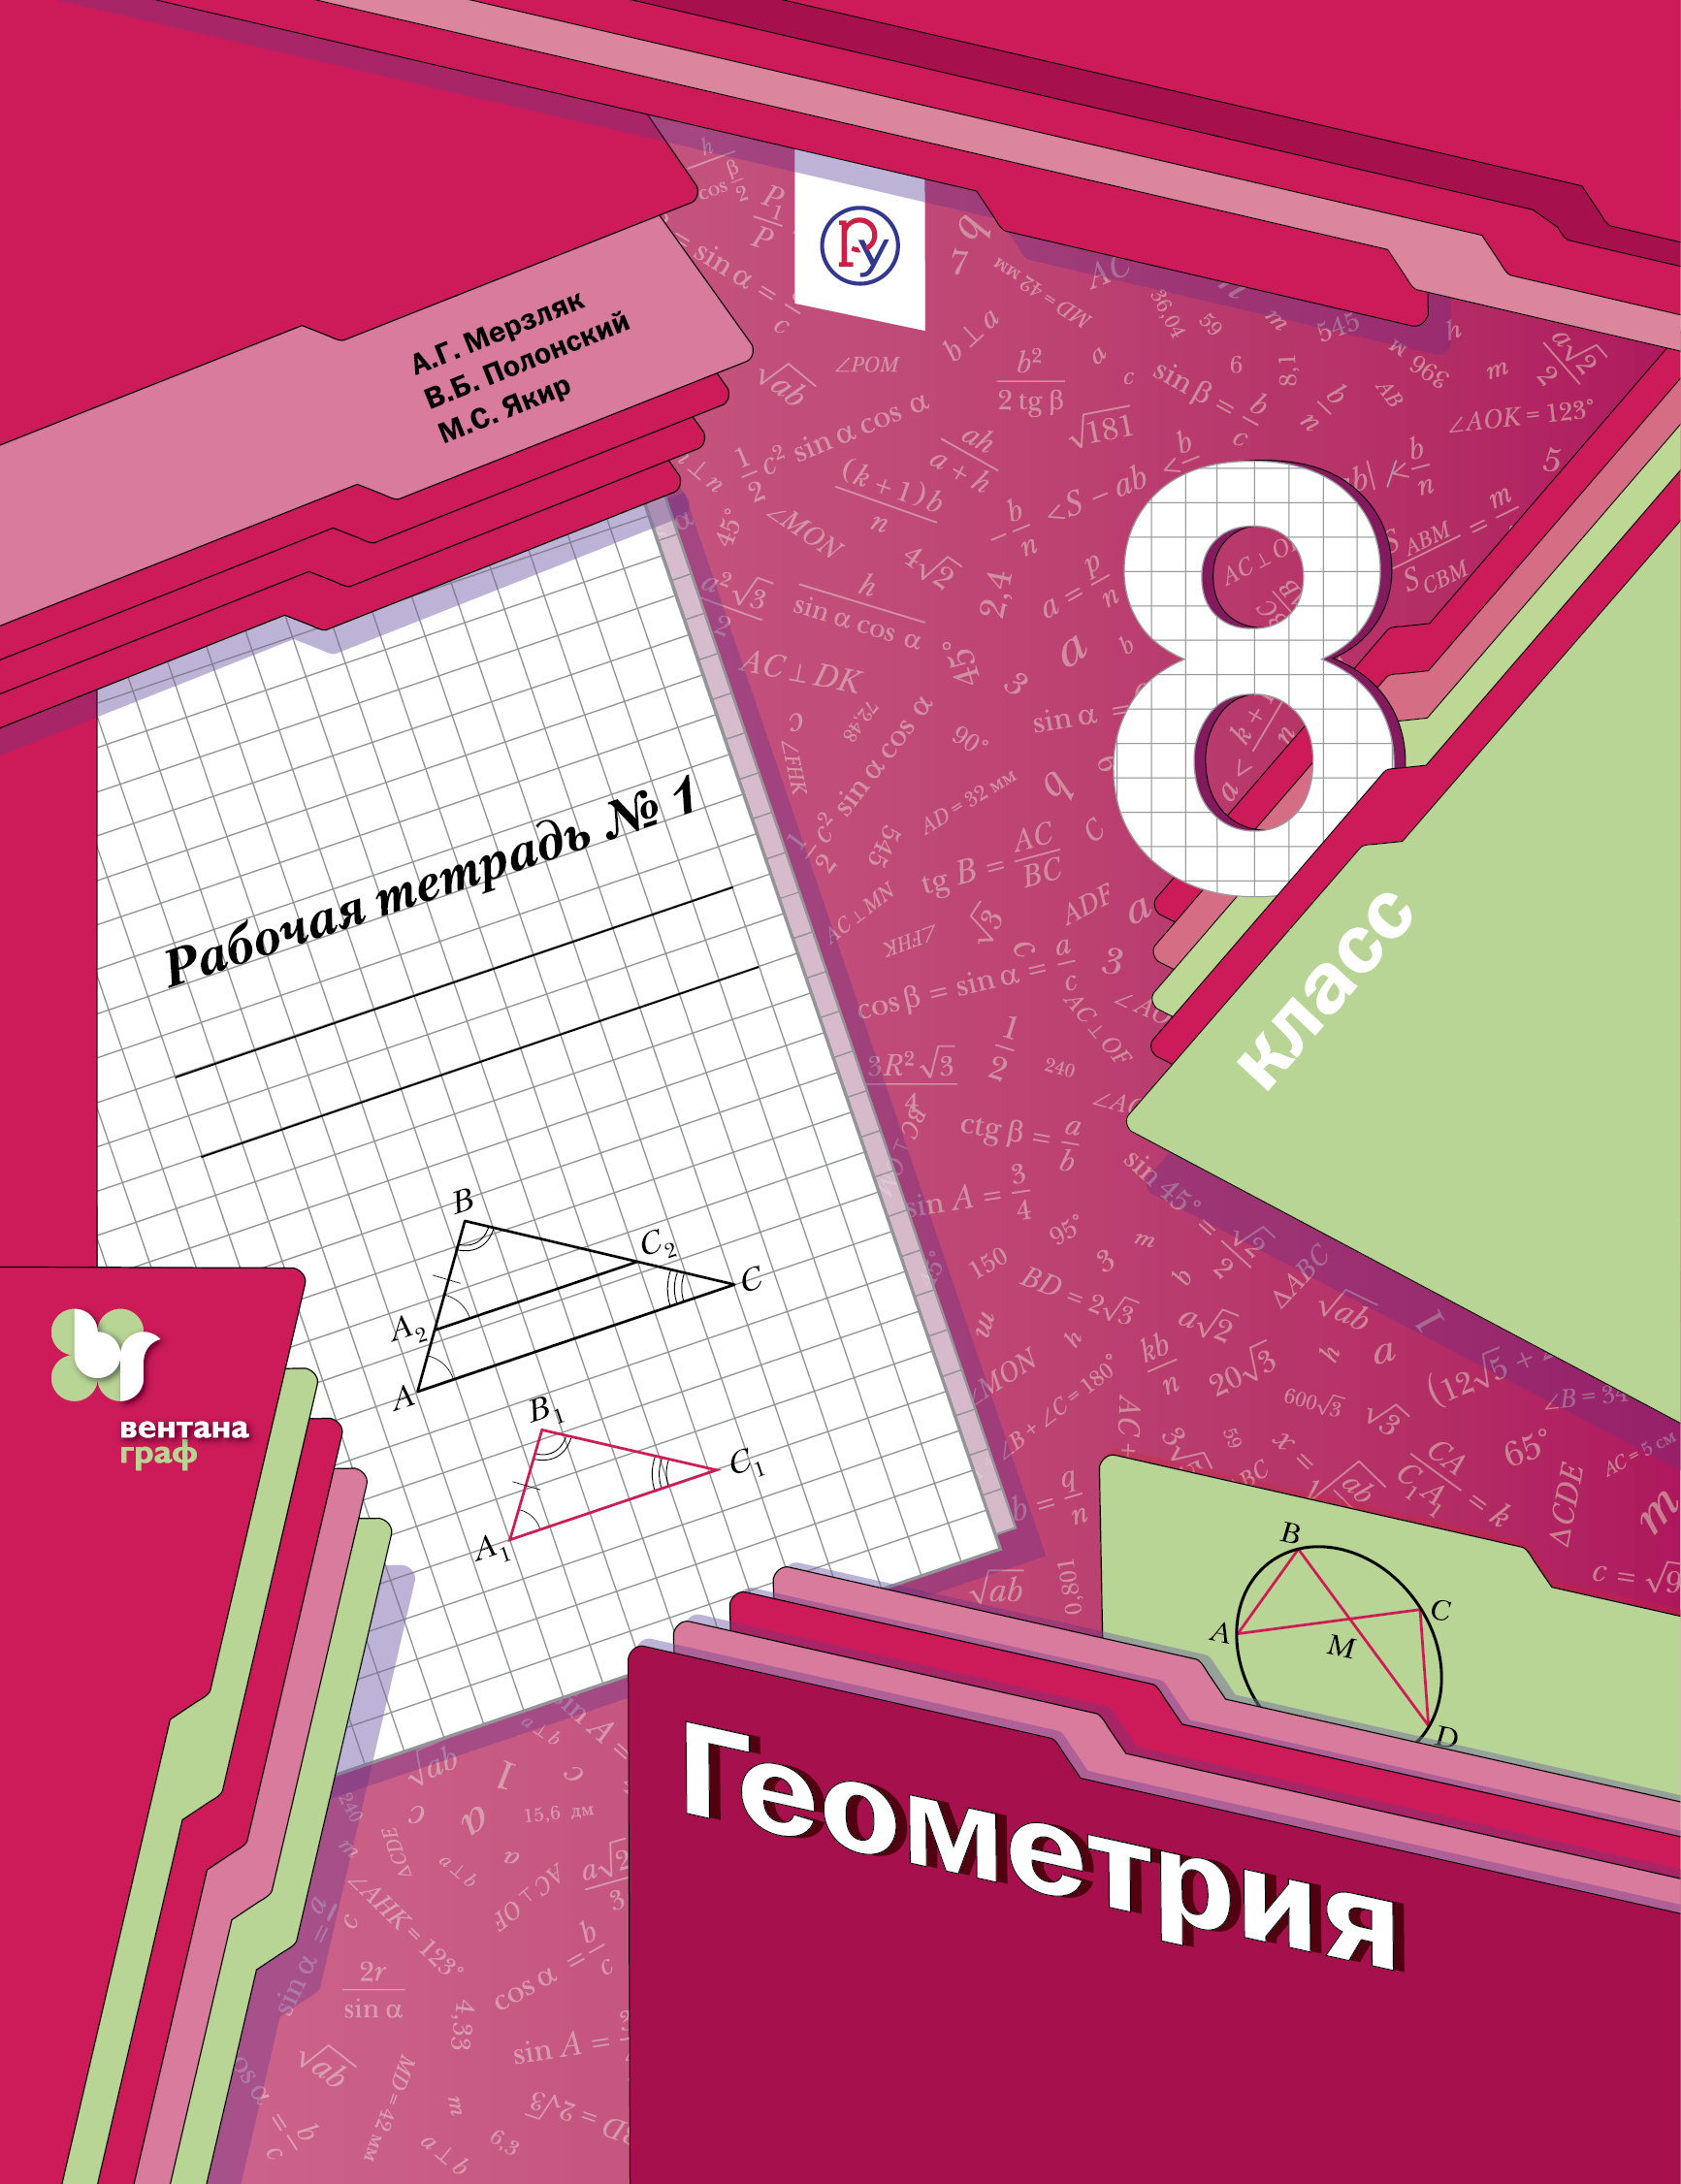 МерзлякА.Г., ПолонскийВ.Б., ЯкирМ.С. Геометрия. 8класс. Рабочая тетрадь №1. цены онлайн